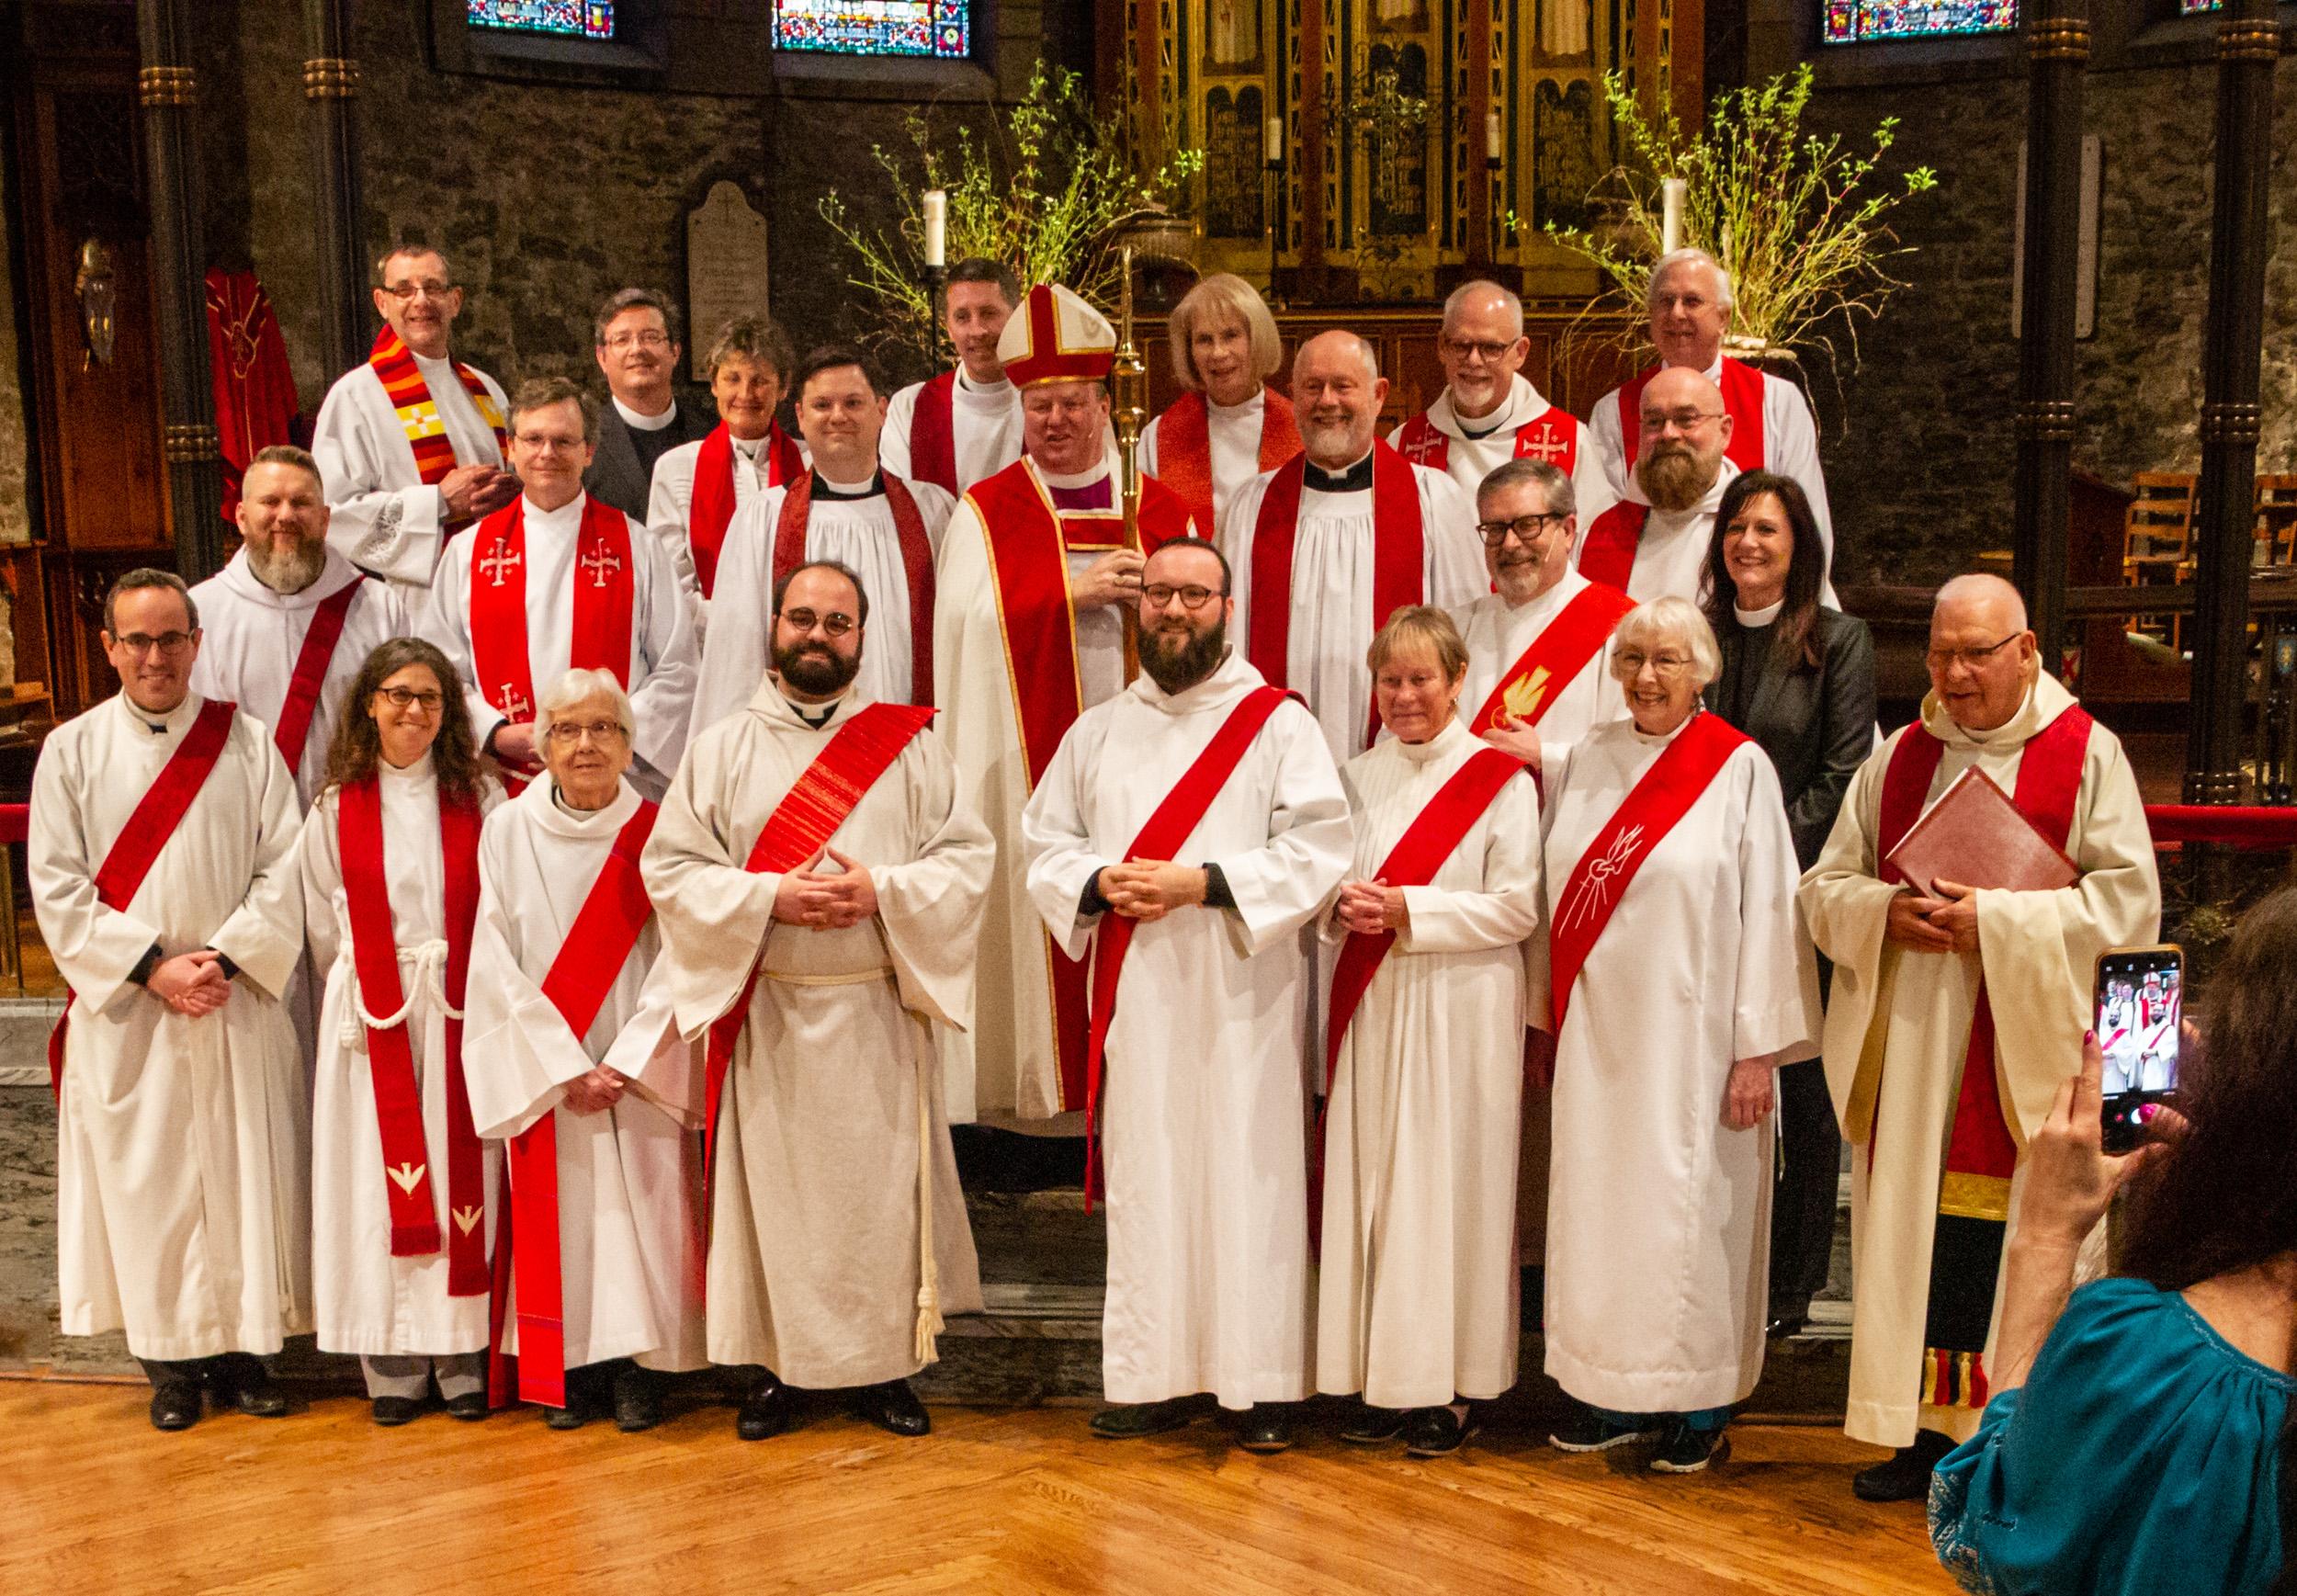 The Ordinations of  Joseph Pierjok and James Yazell to the Diaconate